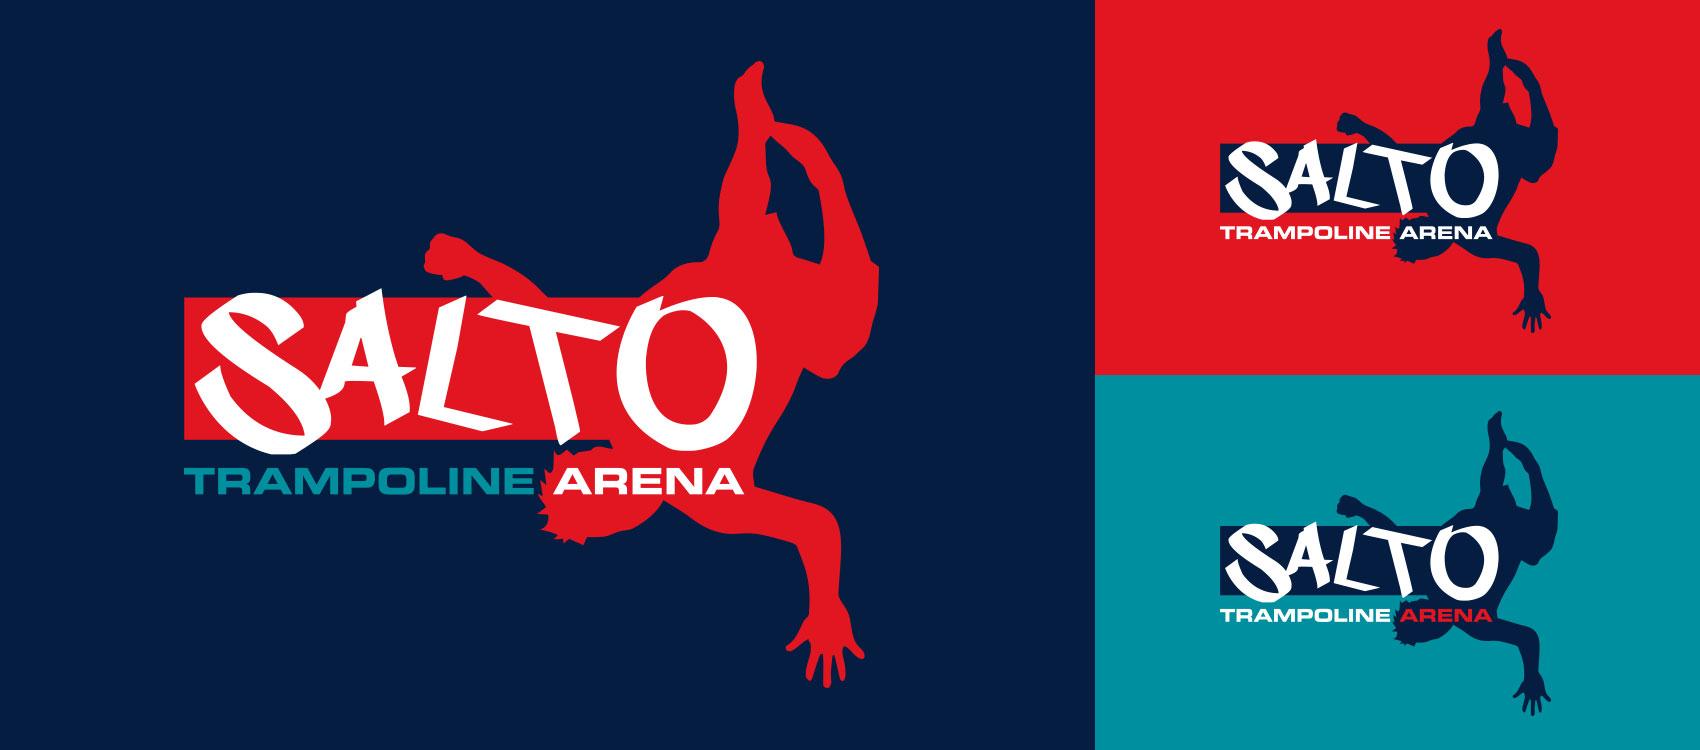 Salto-trampoline-arena-logo